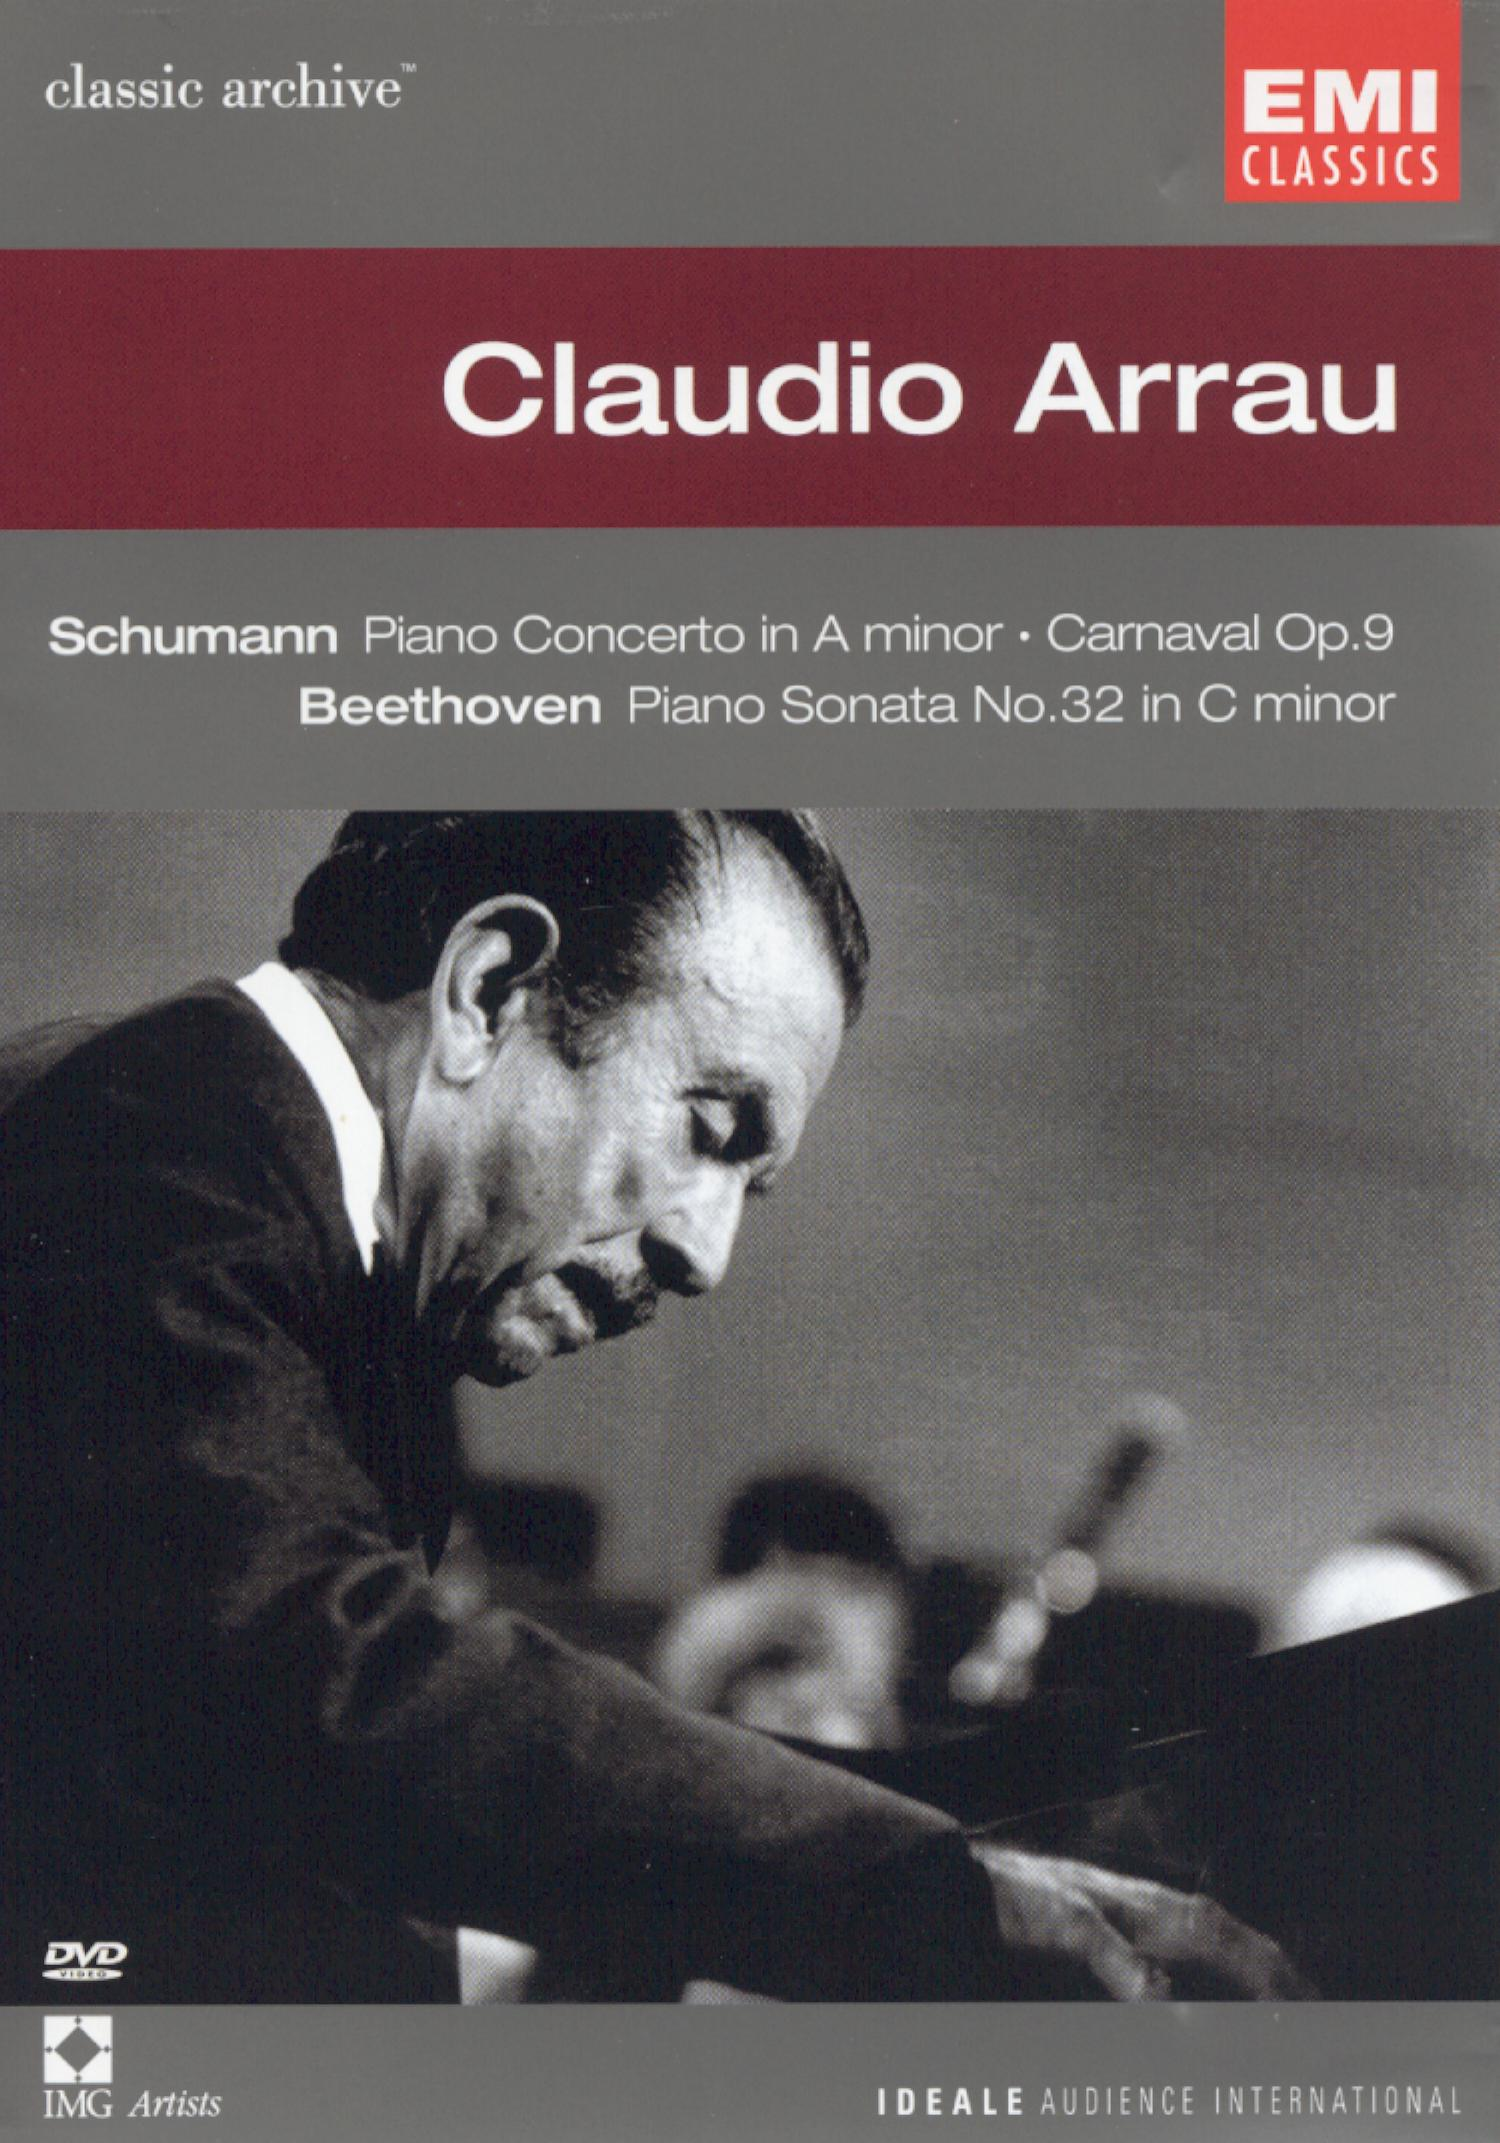 Schumann: Concerto